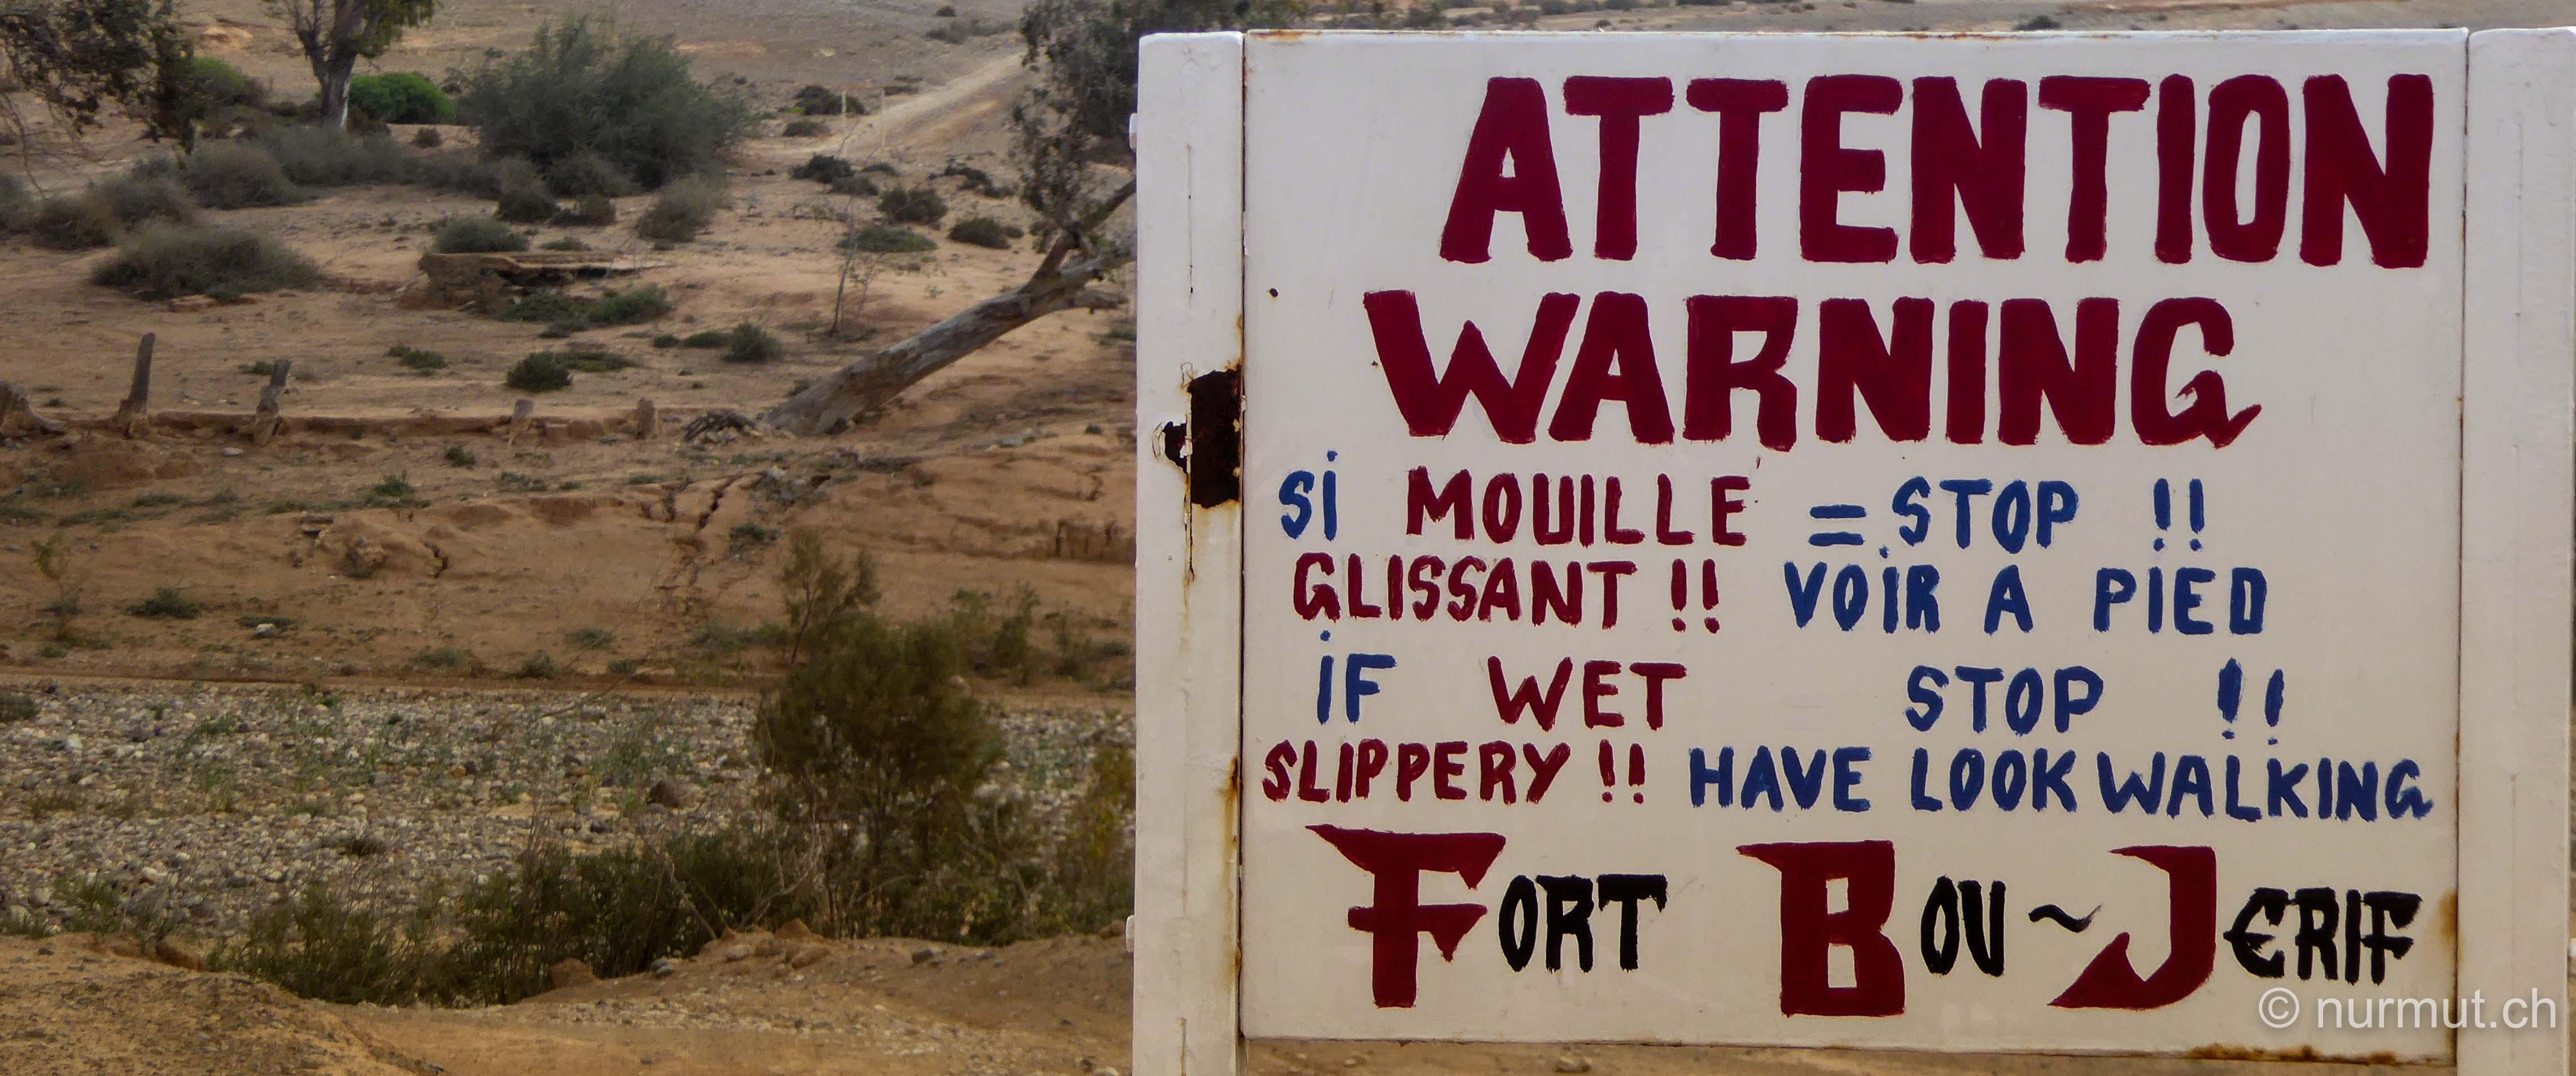 im winter in marokko-offroad fahren-marokko-fort bou jerif-nurmut